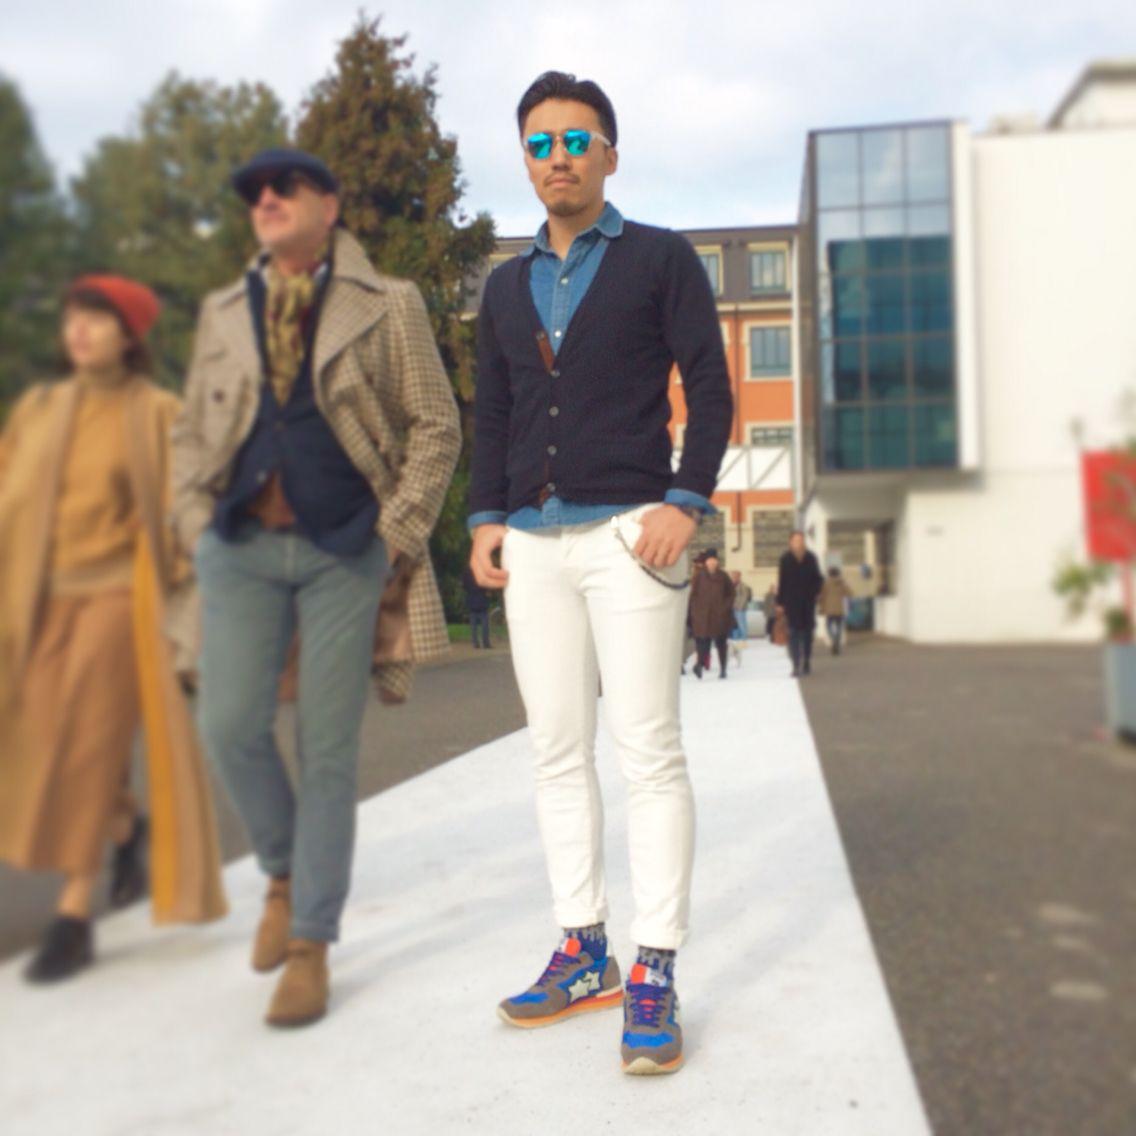 ★CINQUE STELLE STYLE★  HP:http://cinquestellejapan.com  STORE:http://shop.cinquestellejapan.com  #atlanticstars  #atlanticstarsjapan #alessandrosquarzishowroom #cinquestellejapan #ootd #mfw #whitemilano #milano #italy #fashion #coordinate#style #hawkersco #gerba #GerbaChains #GerbaBracelets #ルード #ミラノ#ファッション #コーディネート #スニーカー #Tシャツ #スウェット #ホーカーズ #サングラス #mensfashion #メンズファッション #ジェルバ